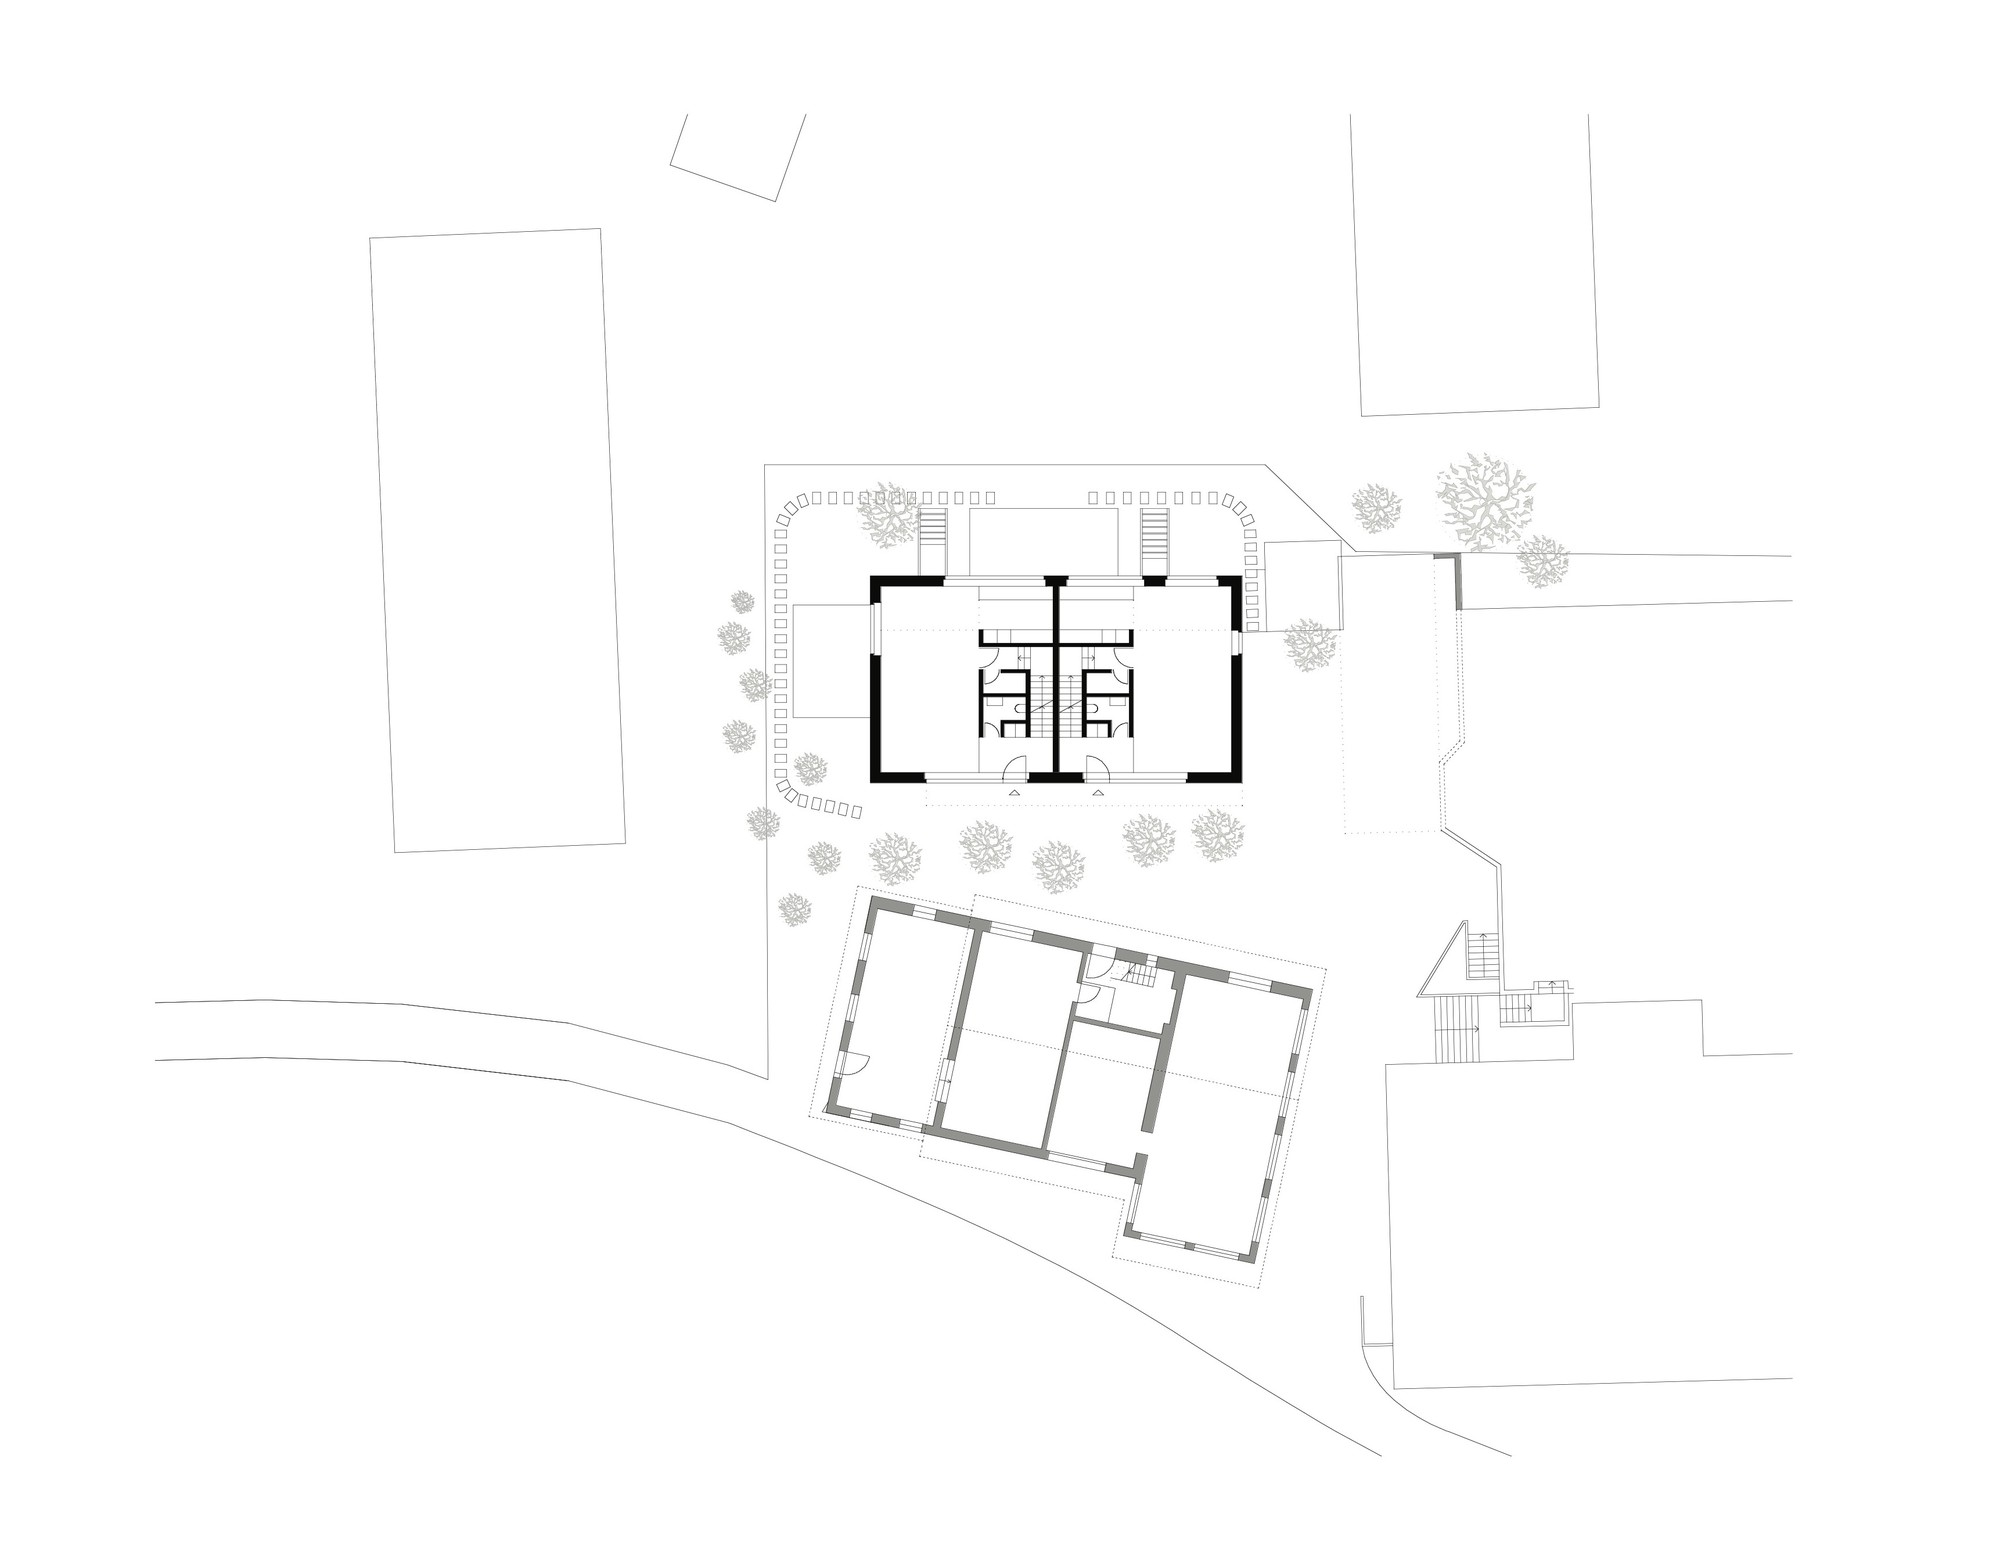 gallery of duplex house in k snacht rossetti wyss architekten 9. Black Bedroom Furniture Sets. Home Design Ideas